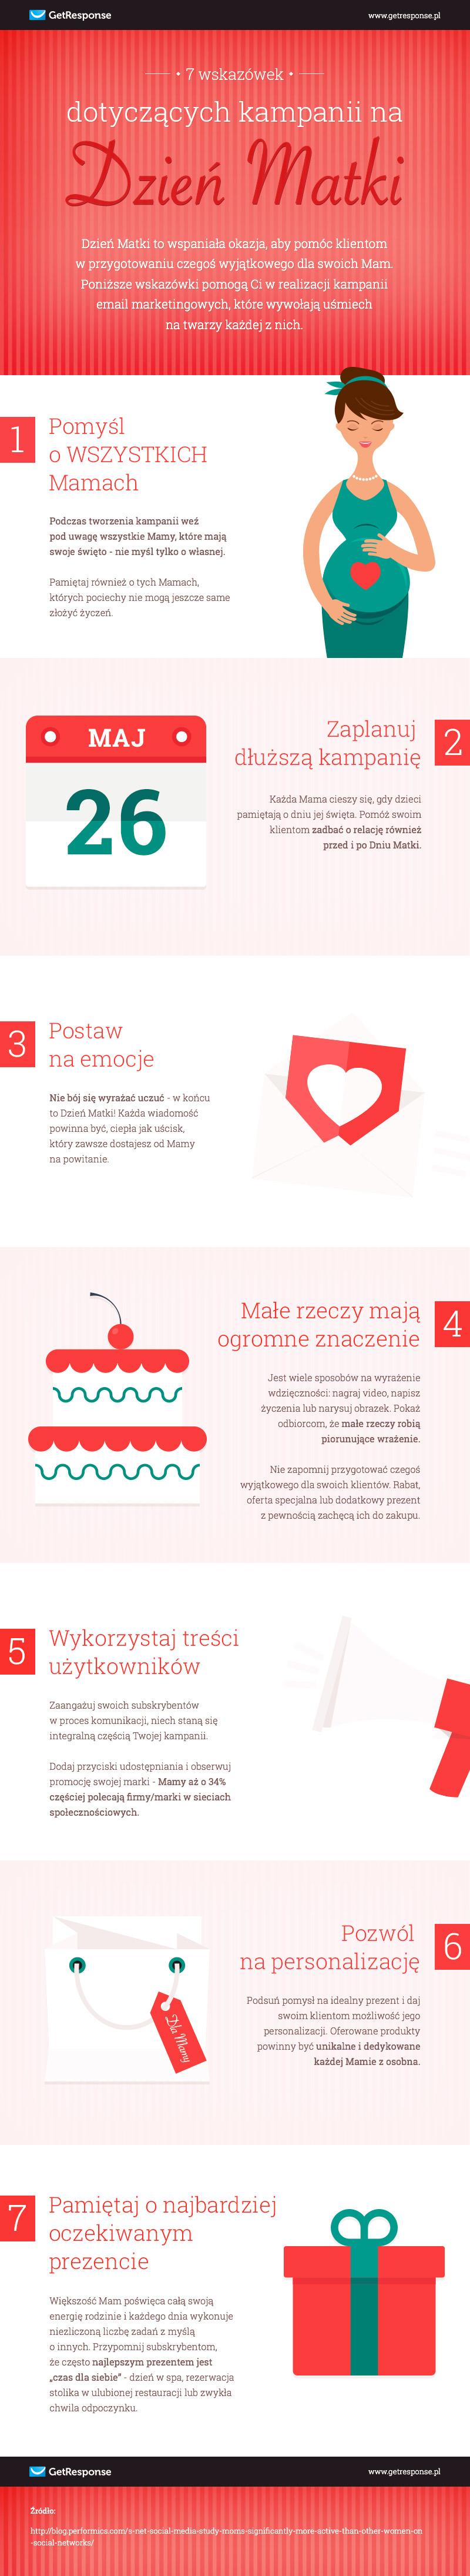 infografika_dzien_matki